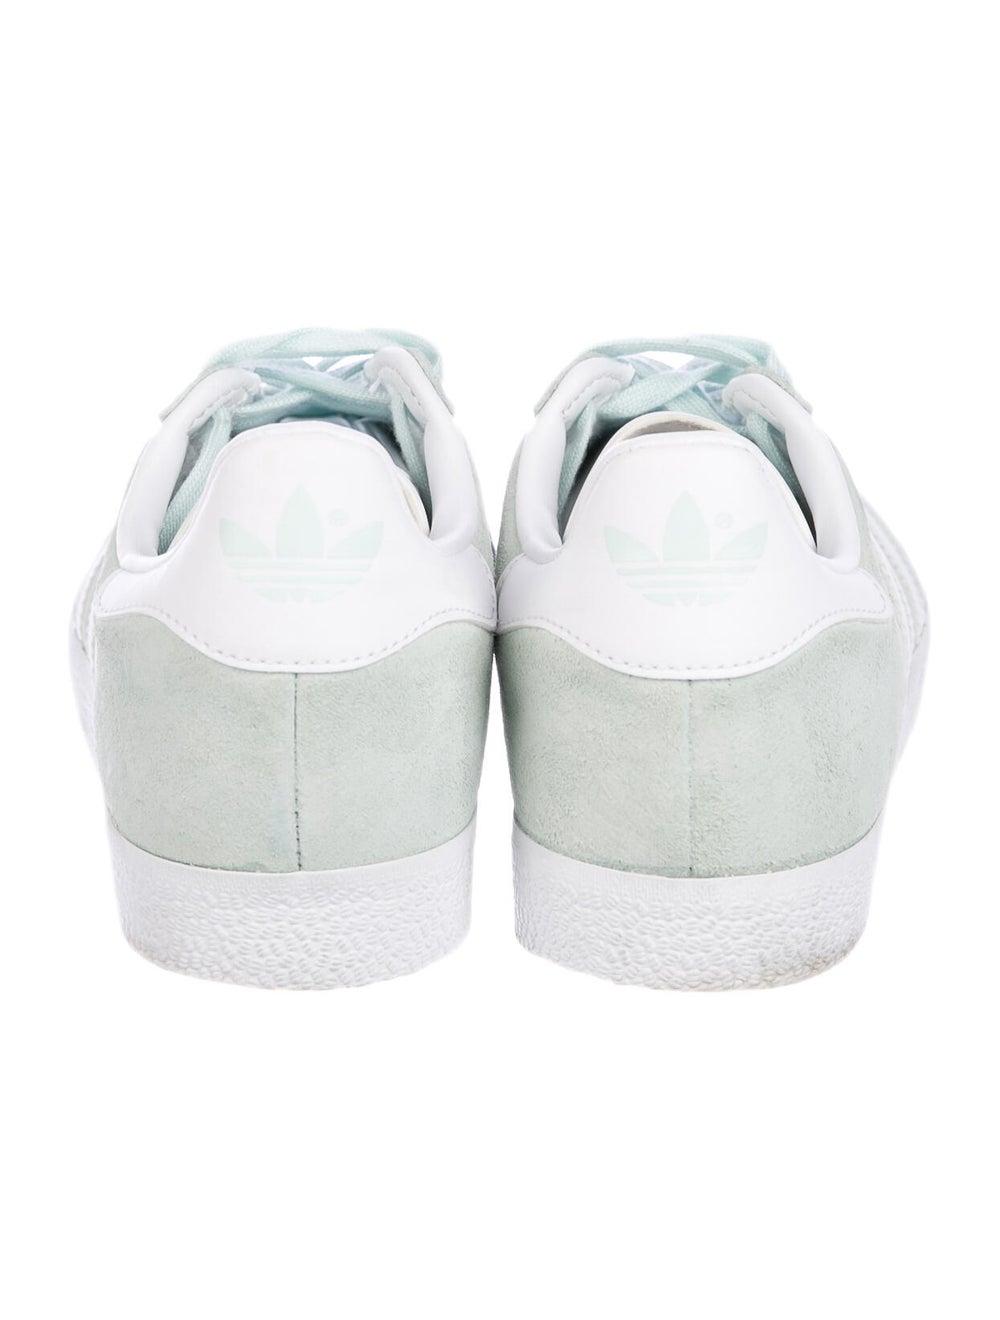 Adidas Gazelle Sneakers Green - image 4